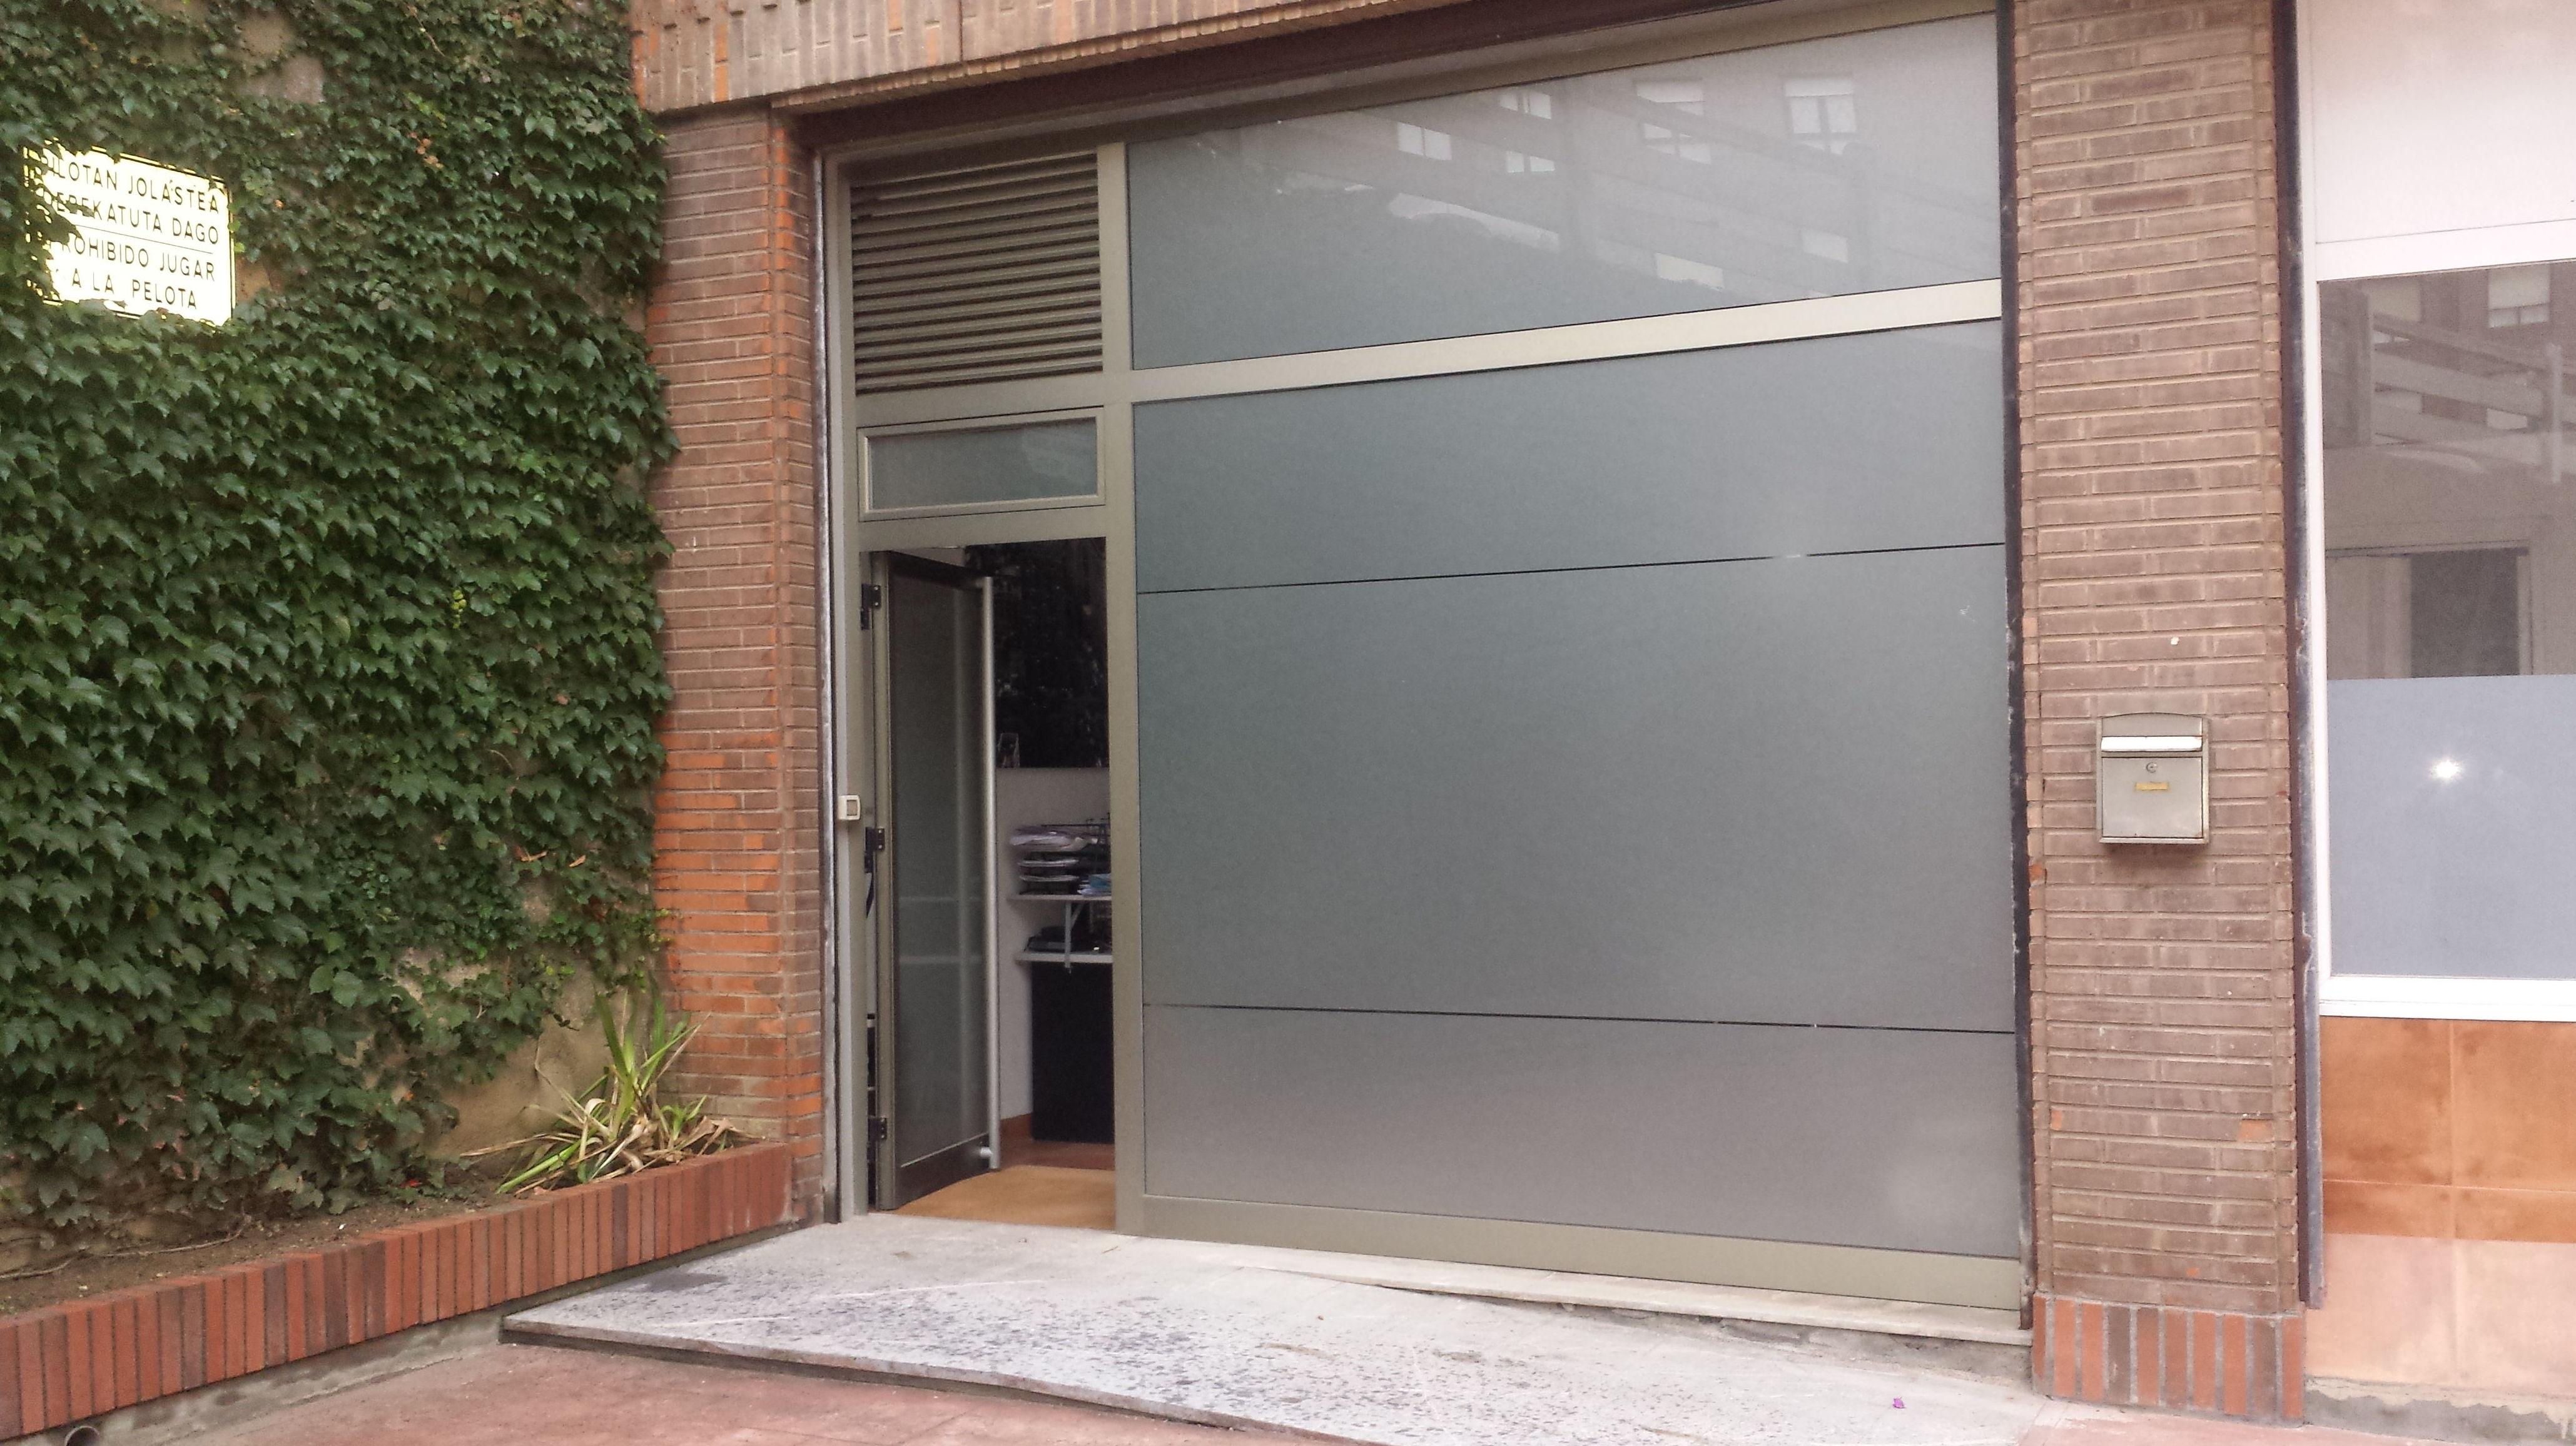 gabinete arquitectura técnica Piñaga 9 ALGORTA GETXO